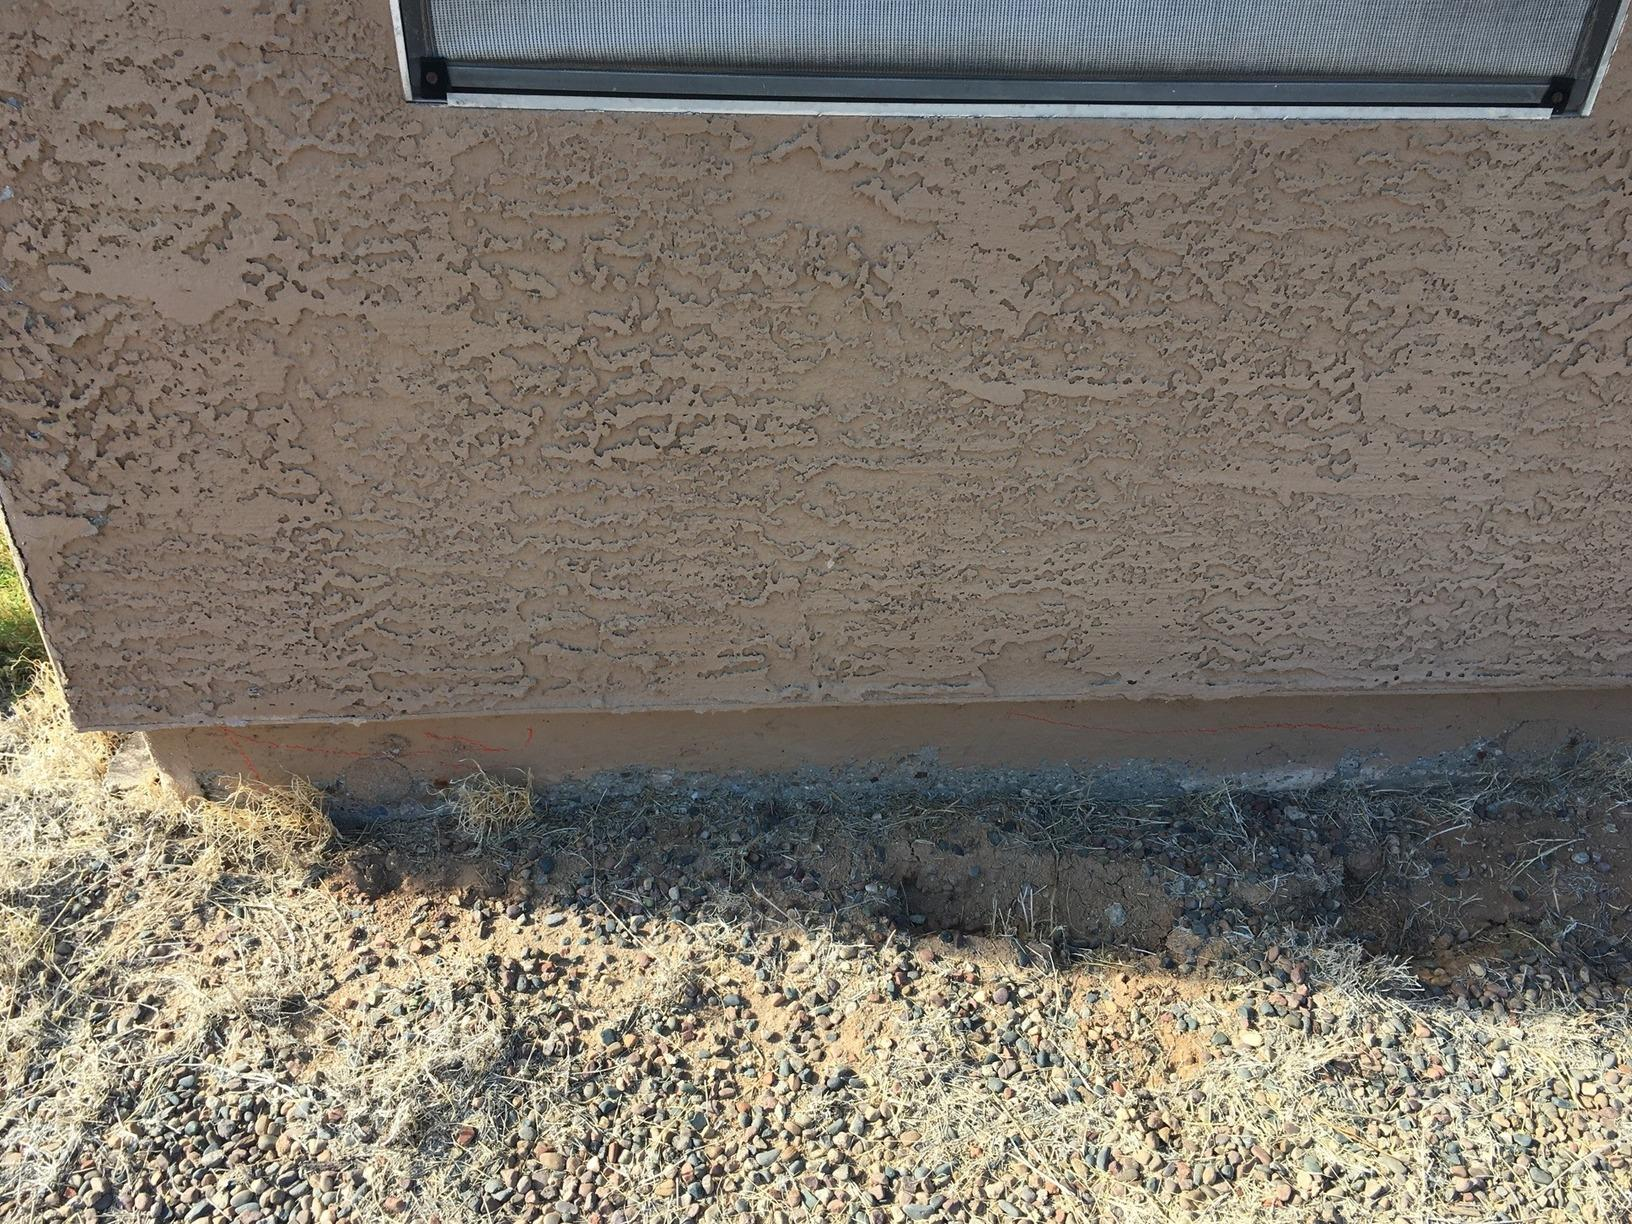 Concrete Stem Wall Repair - Gilbert, AZ - Before Photo